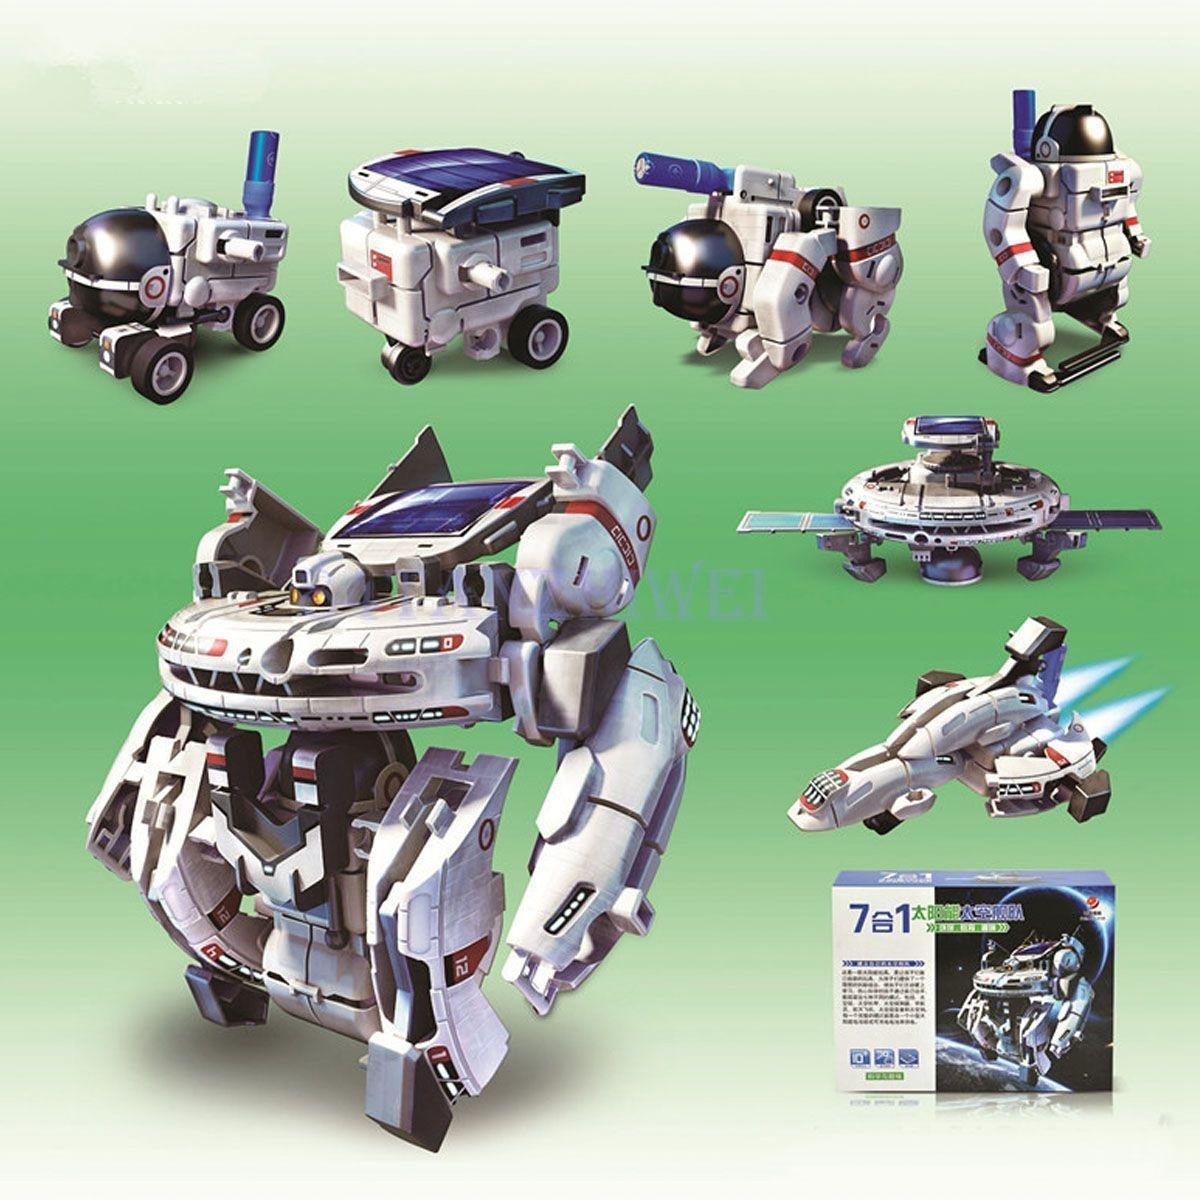 Electr/ónica Rey 14 en 1 Robot Solar Juguete Educativo de Rob/ótica